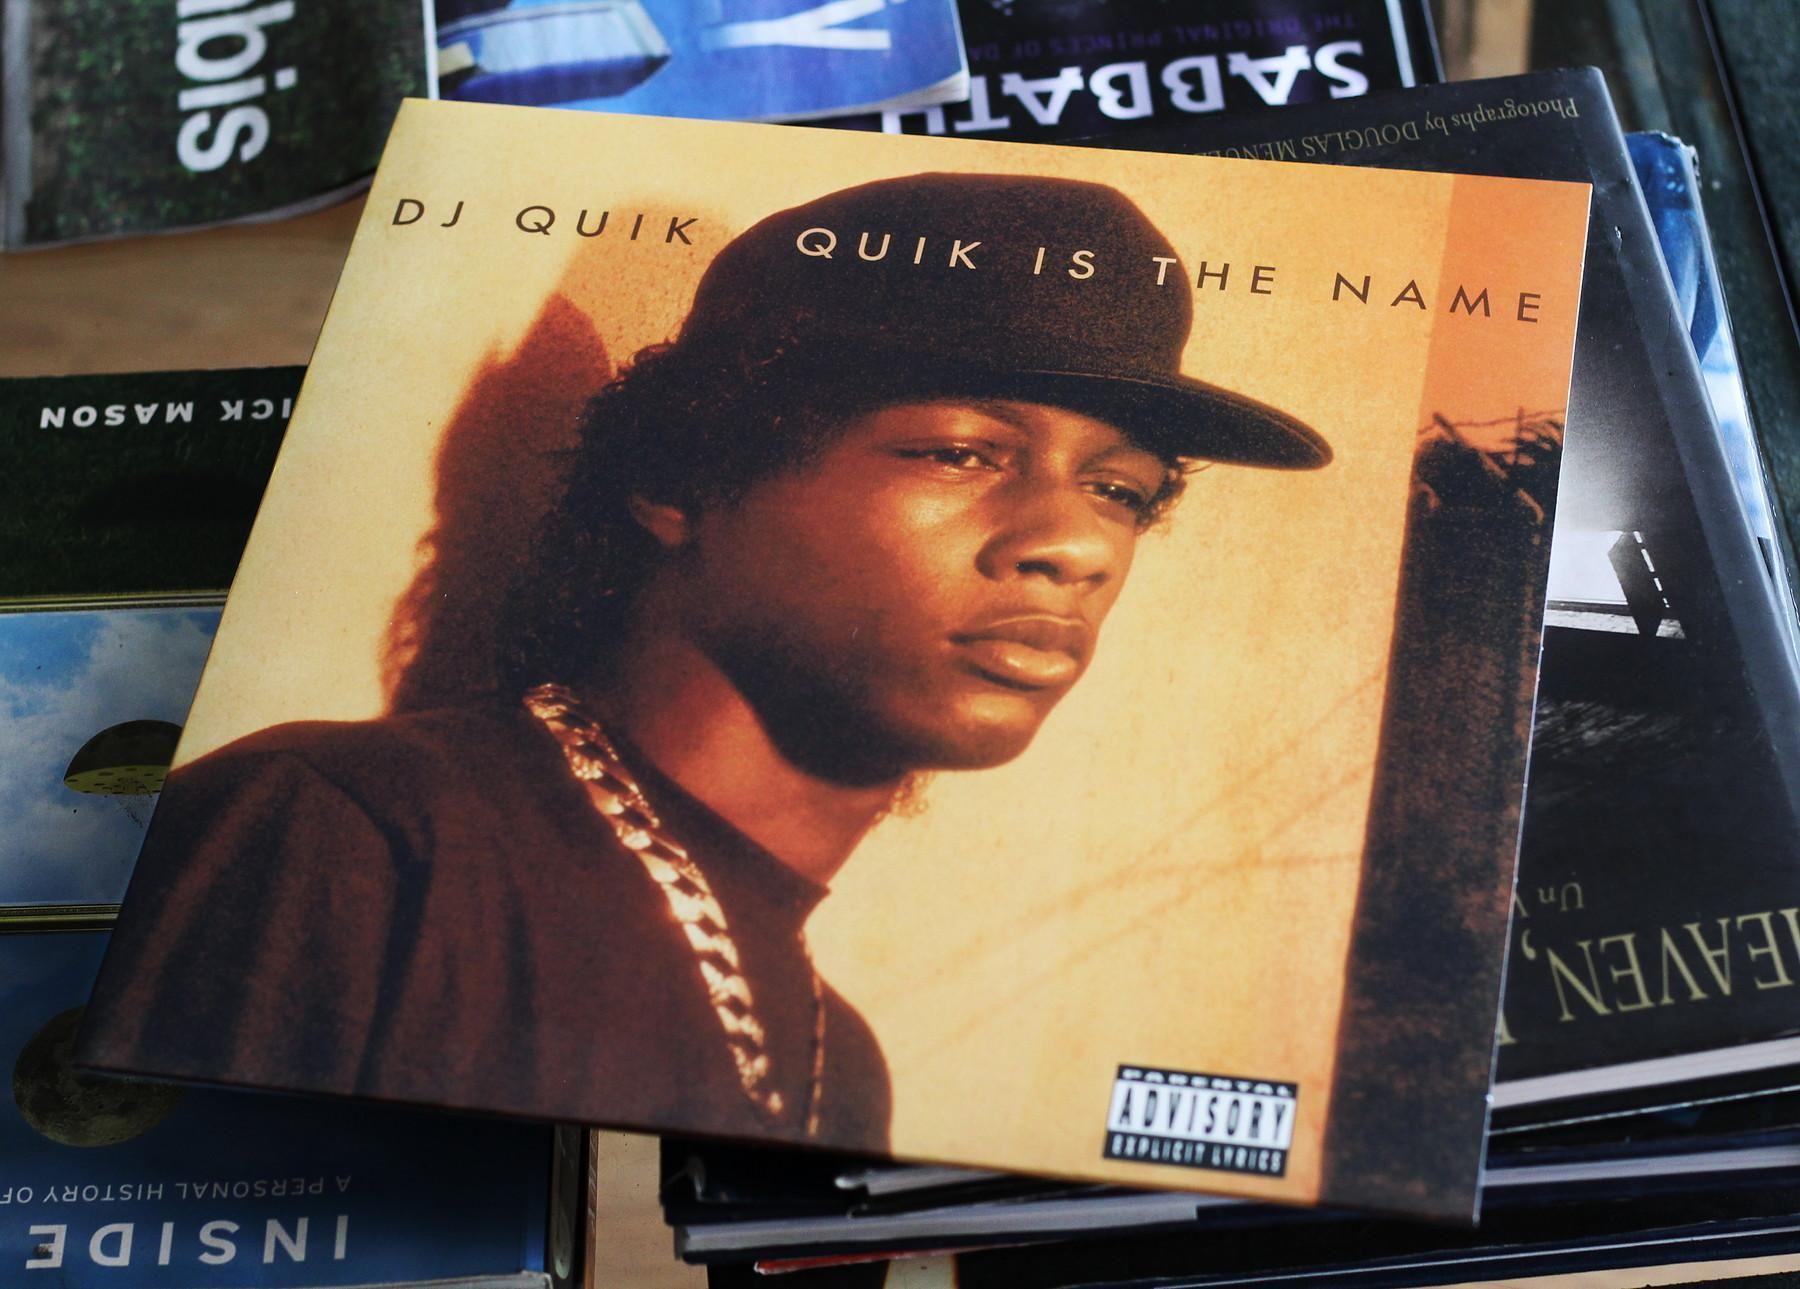 Dj Quik Quik Is The Name 1991 1800x1289 Oc Dj Quik Dj Hip Hop Rap